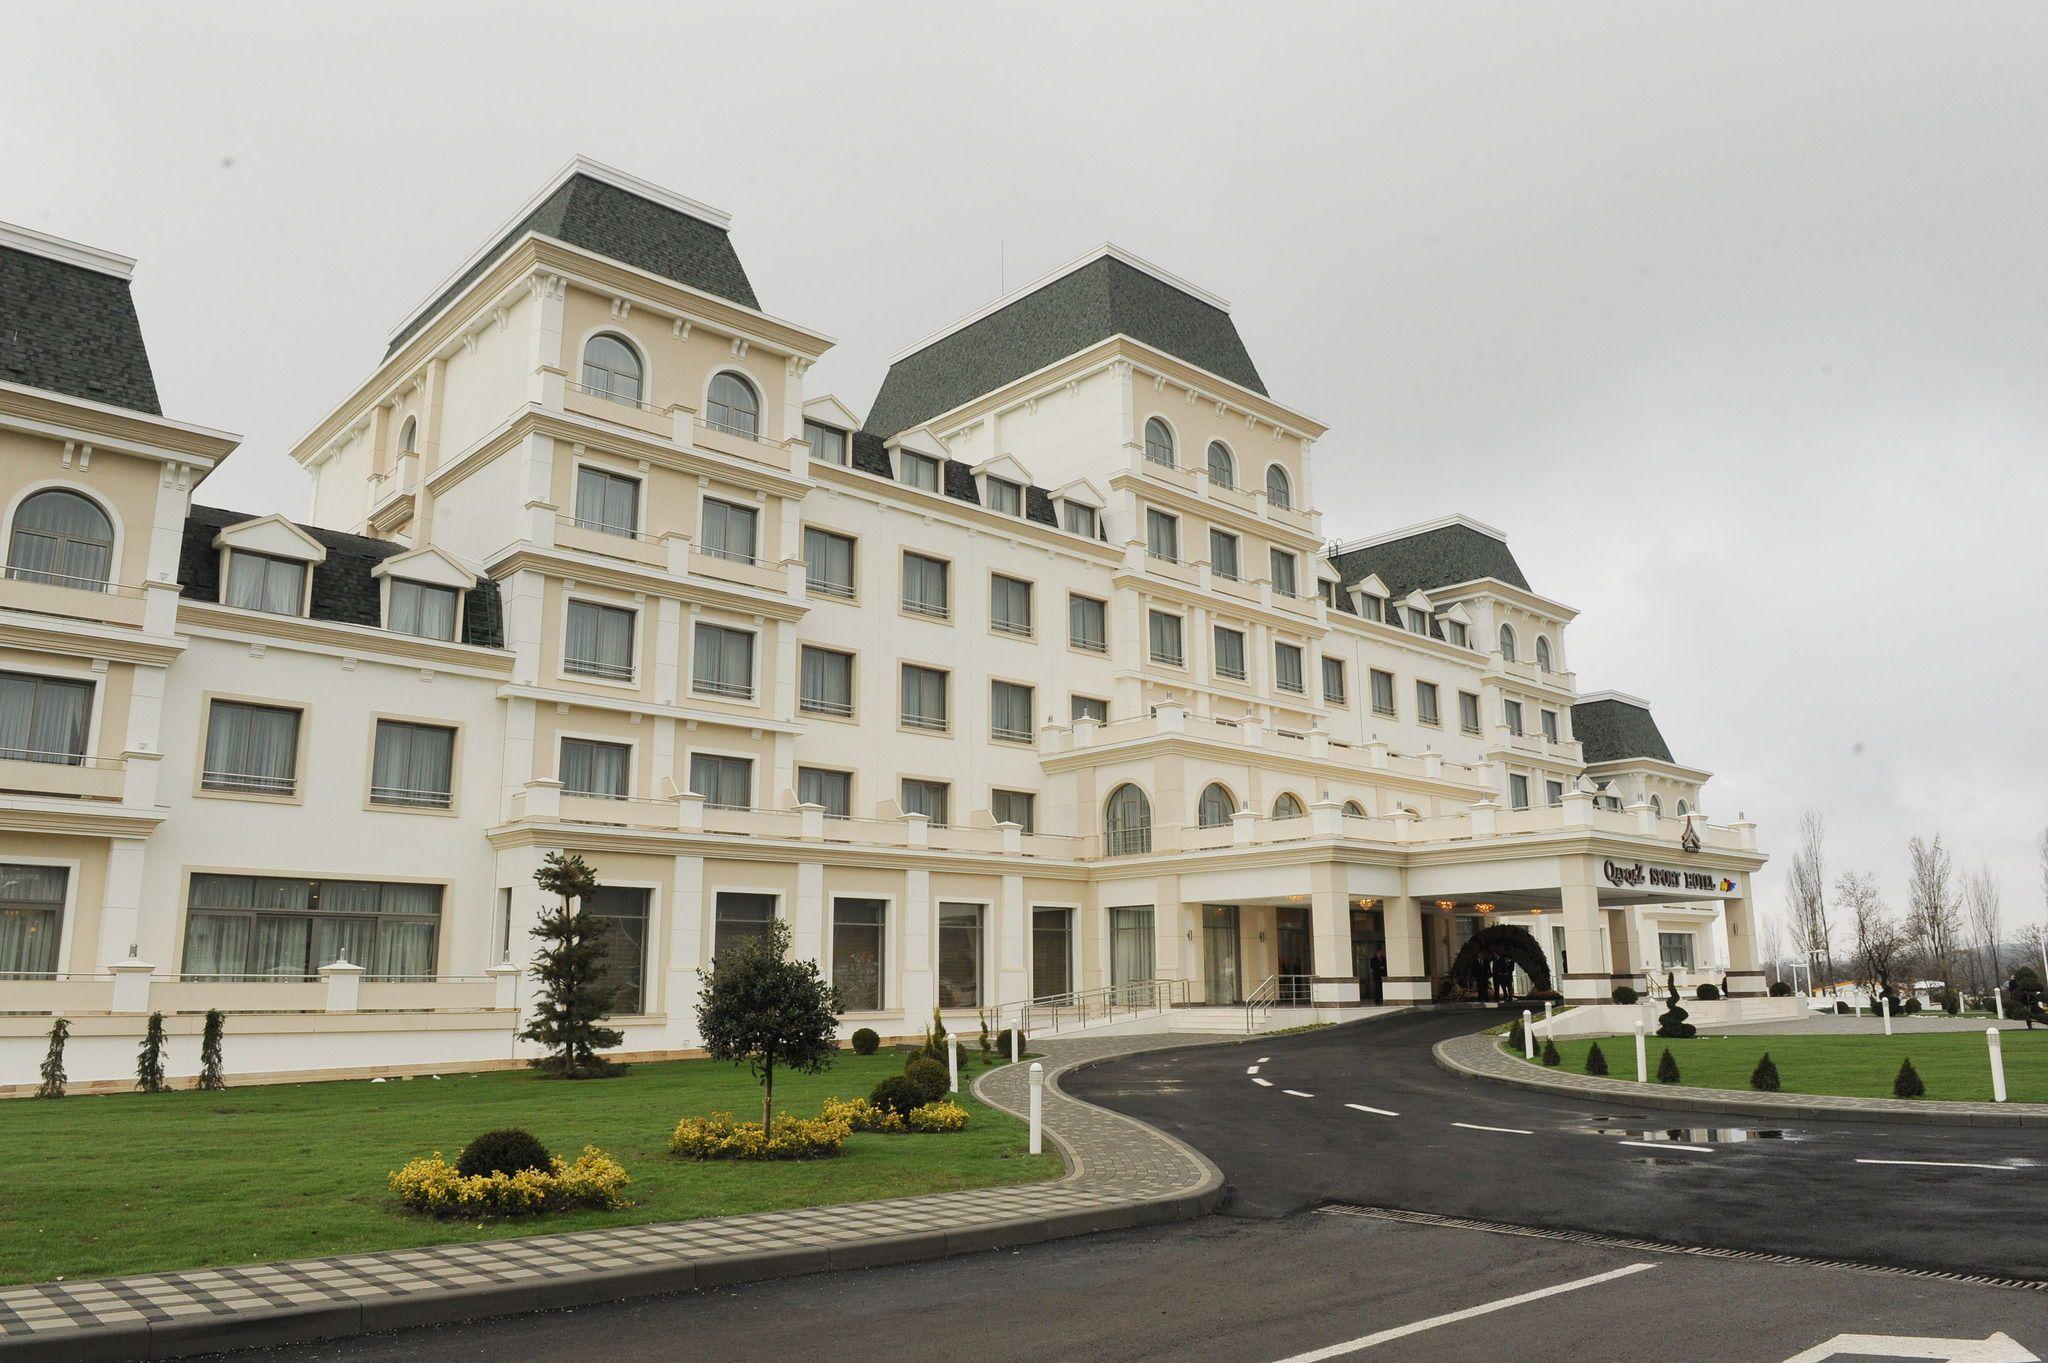 Qafqaz Riverside Hotel فندق قفقاز ريفرسايد Qafqaz Riverside Oteli Riverside Hotel Natural Scenery Hotel